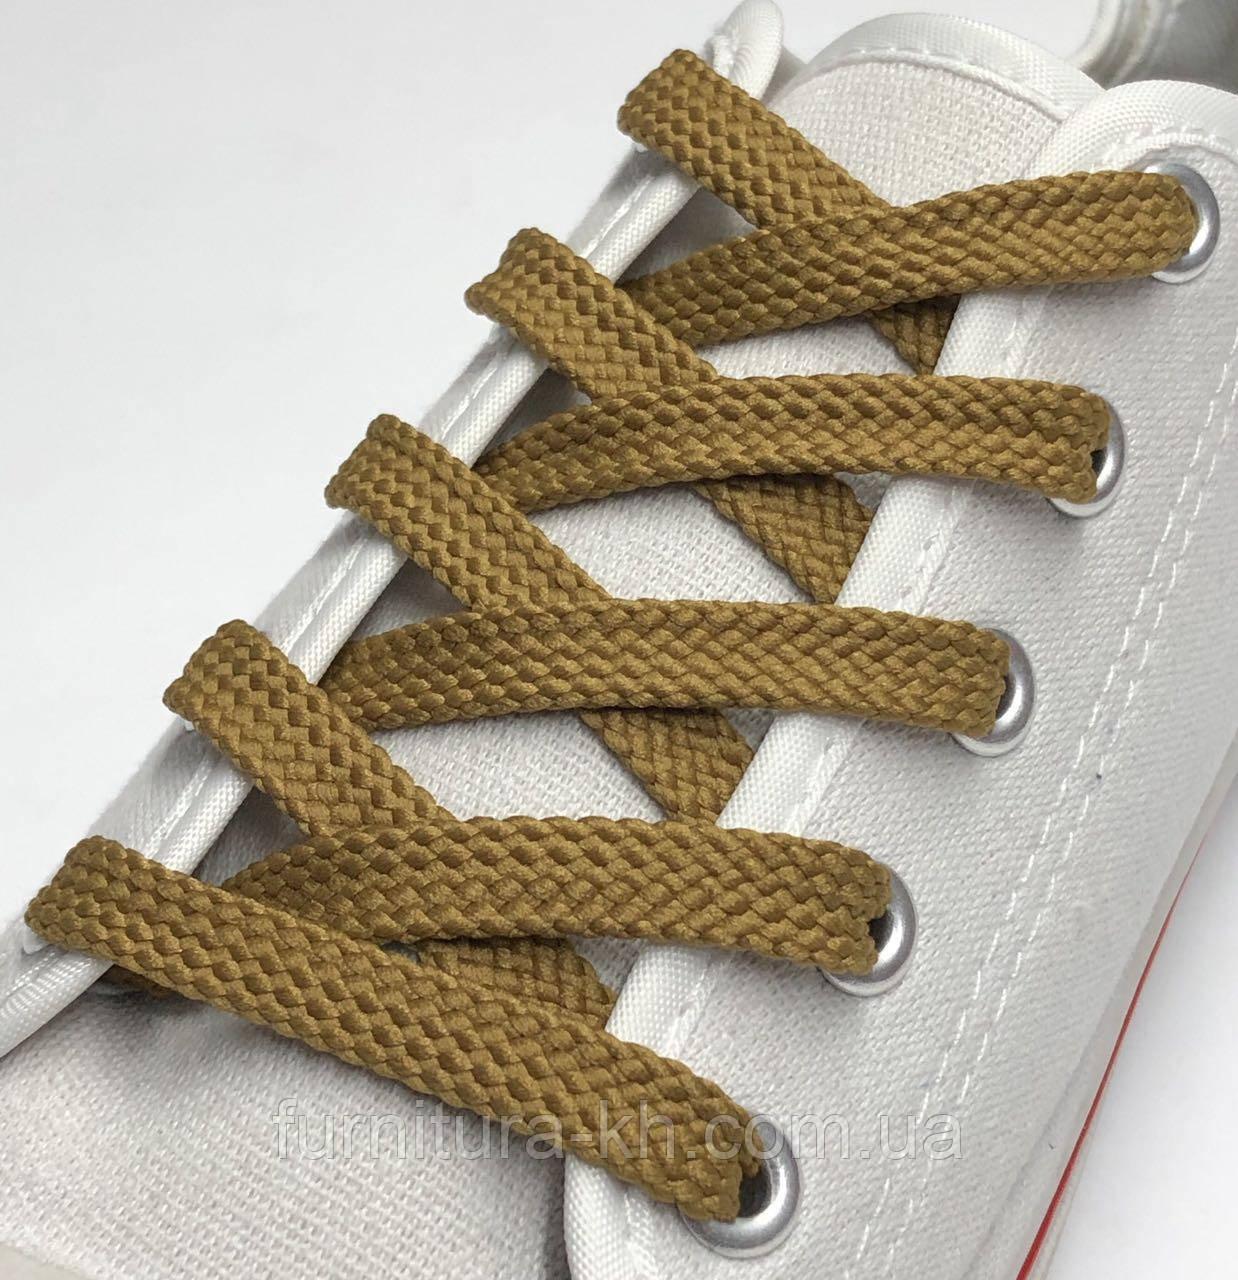 Шнурок Простой Плоский Длинна 1,5 м  цвет Темно Рыжий (ширина 7 мм)